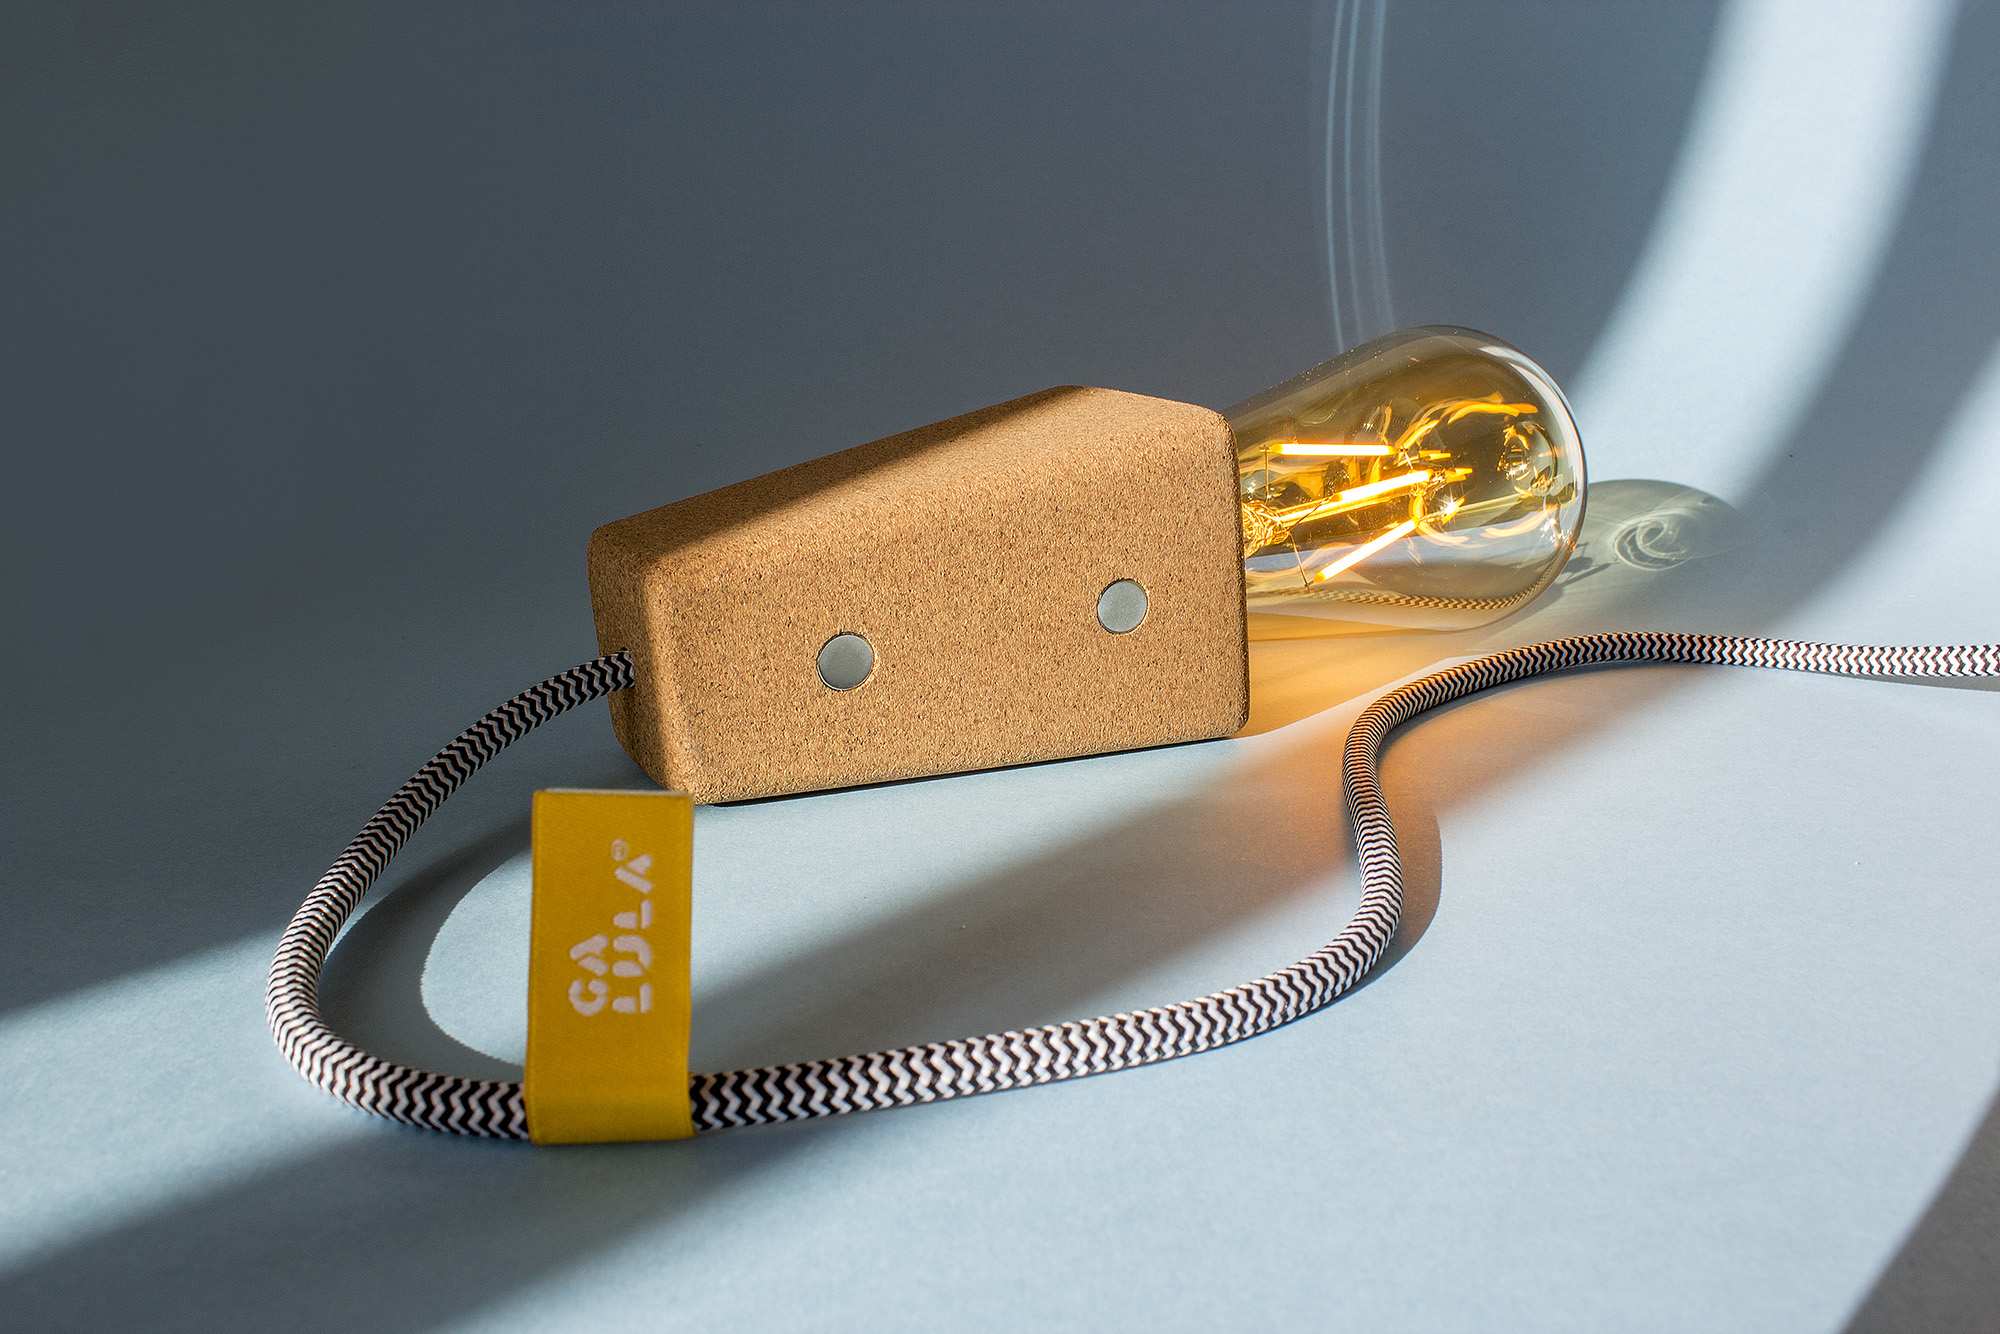 low-Galula-magneto-lamp-amb-05.jpg